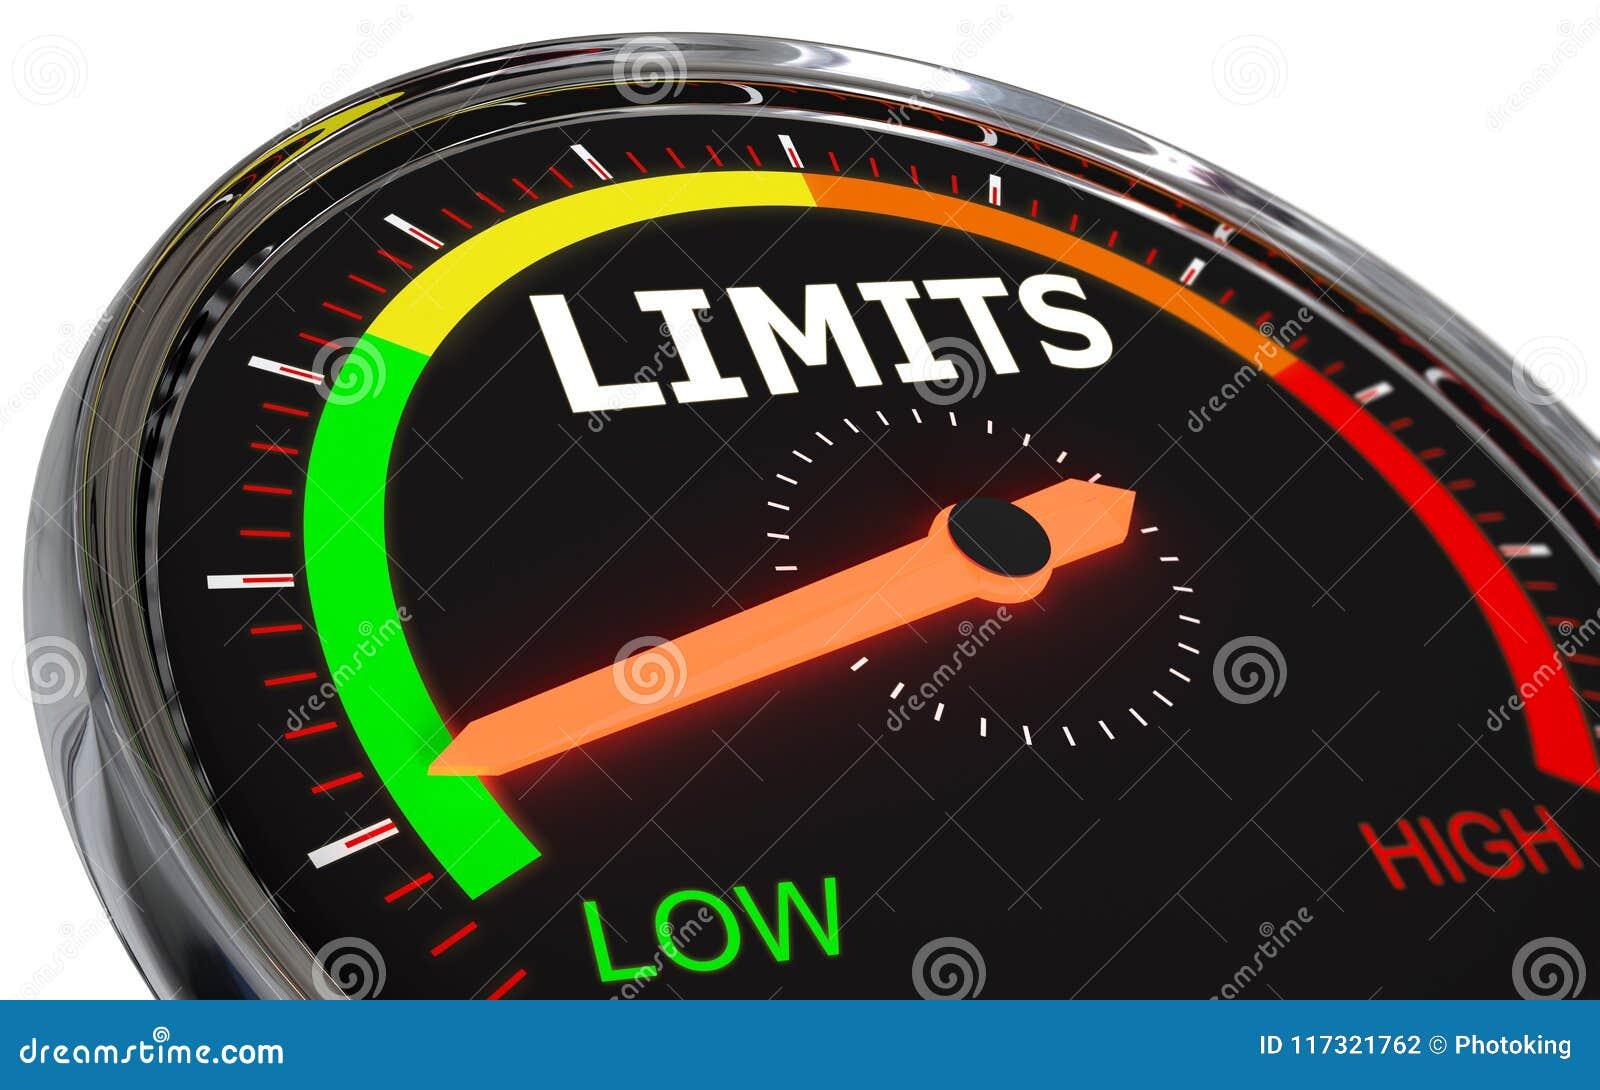 Measuring limits level